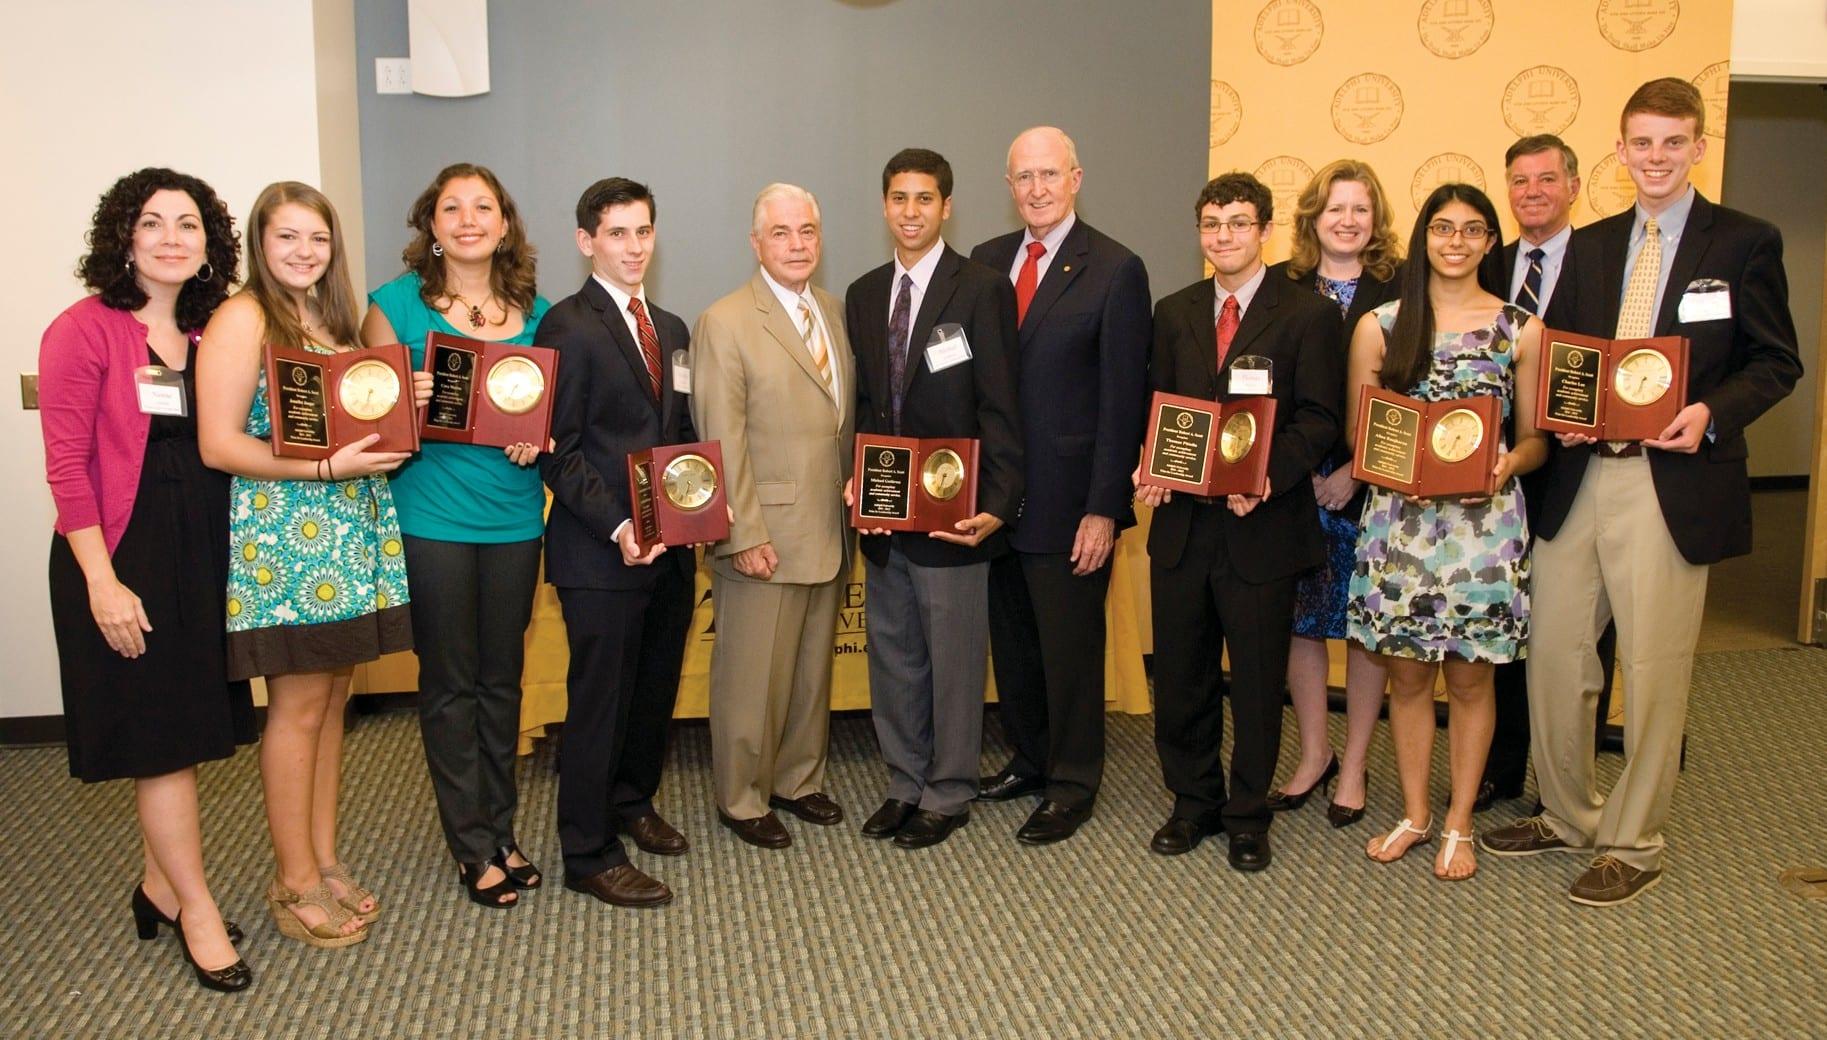 Adelphi Honors Garden City High School Students | Garden City News